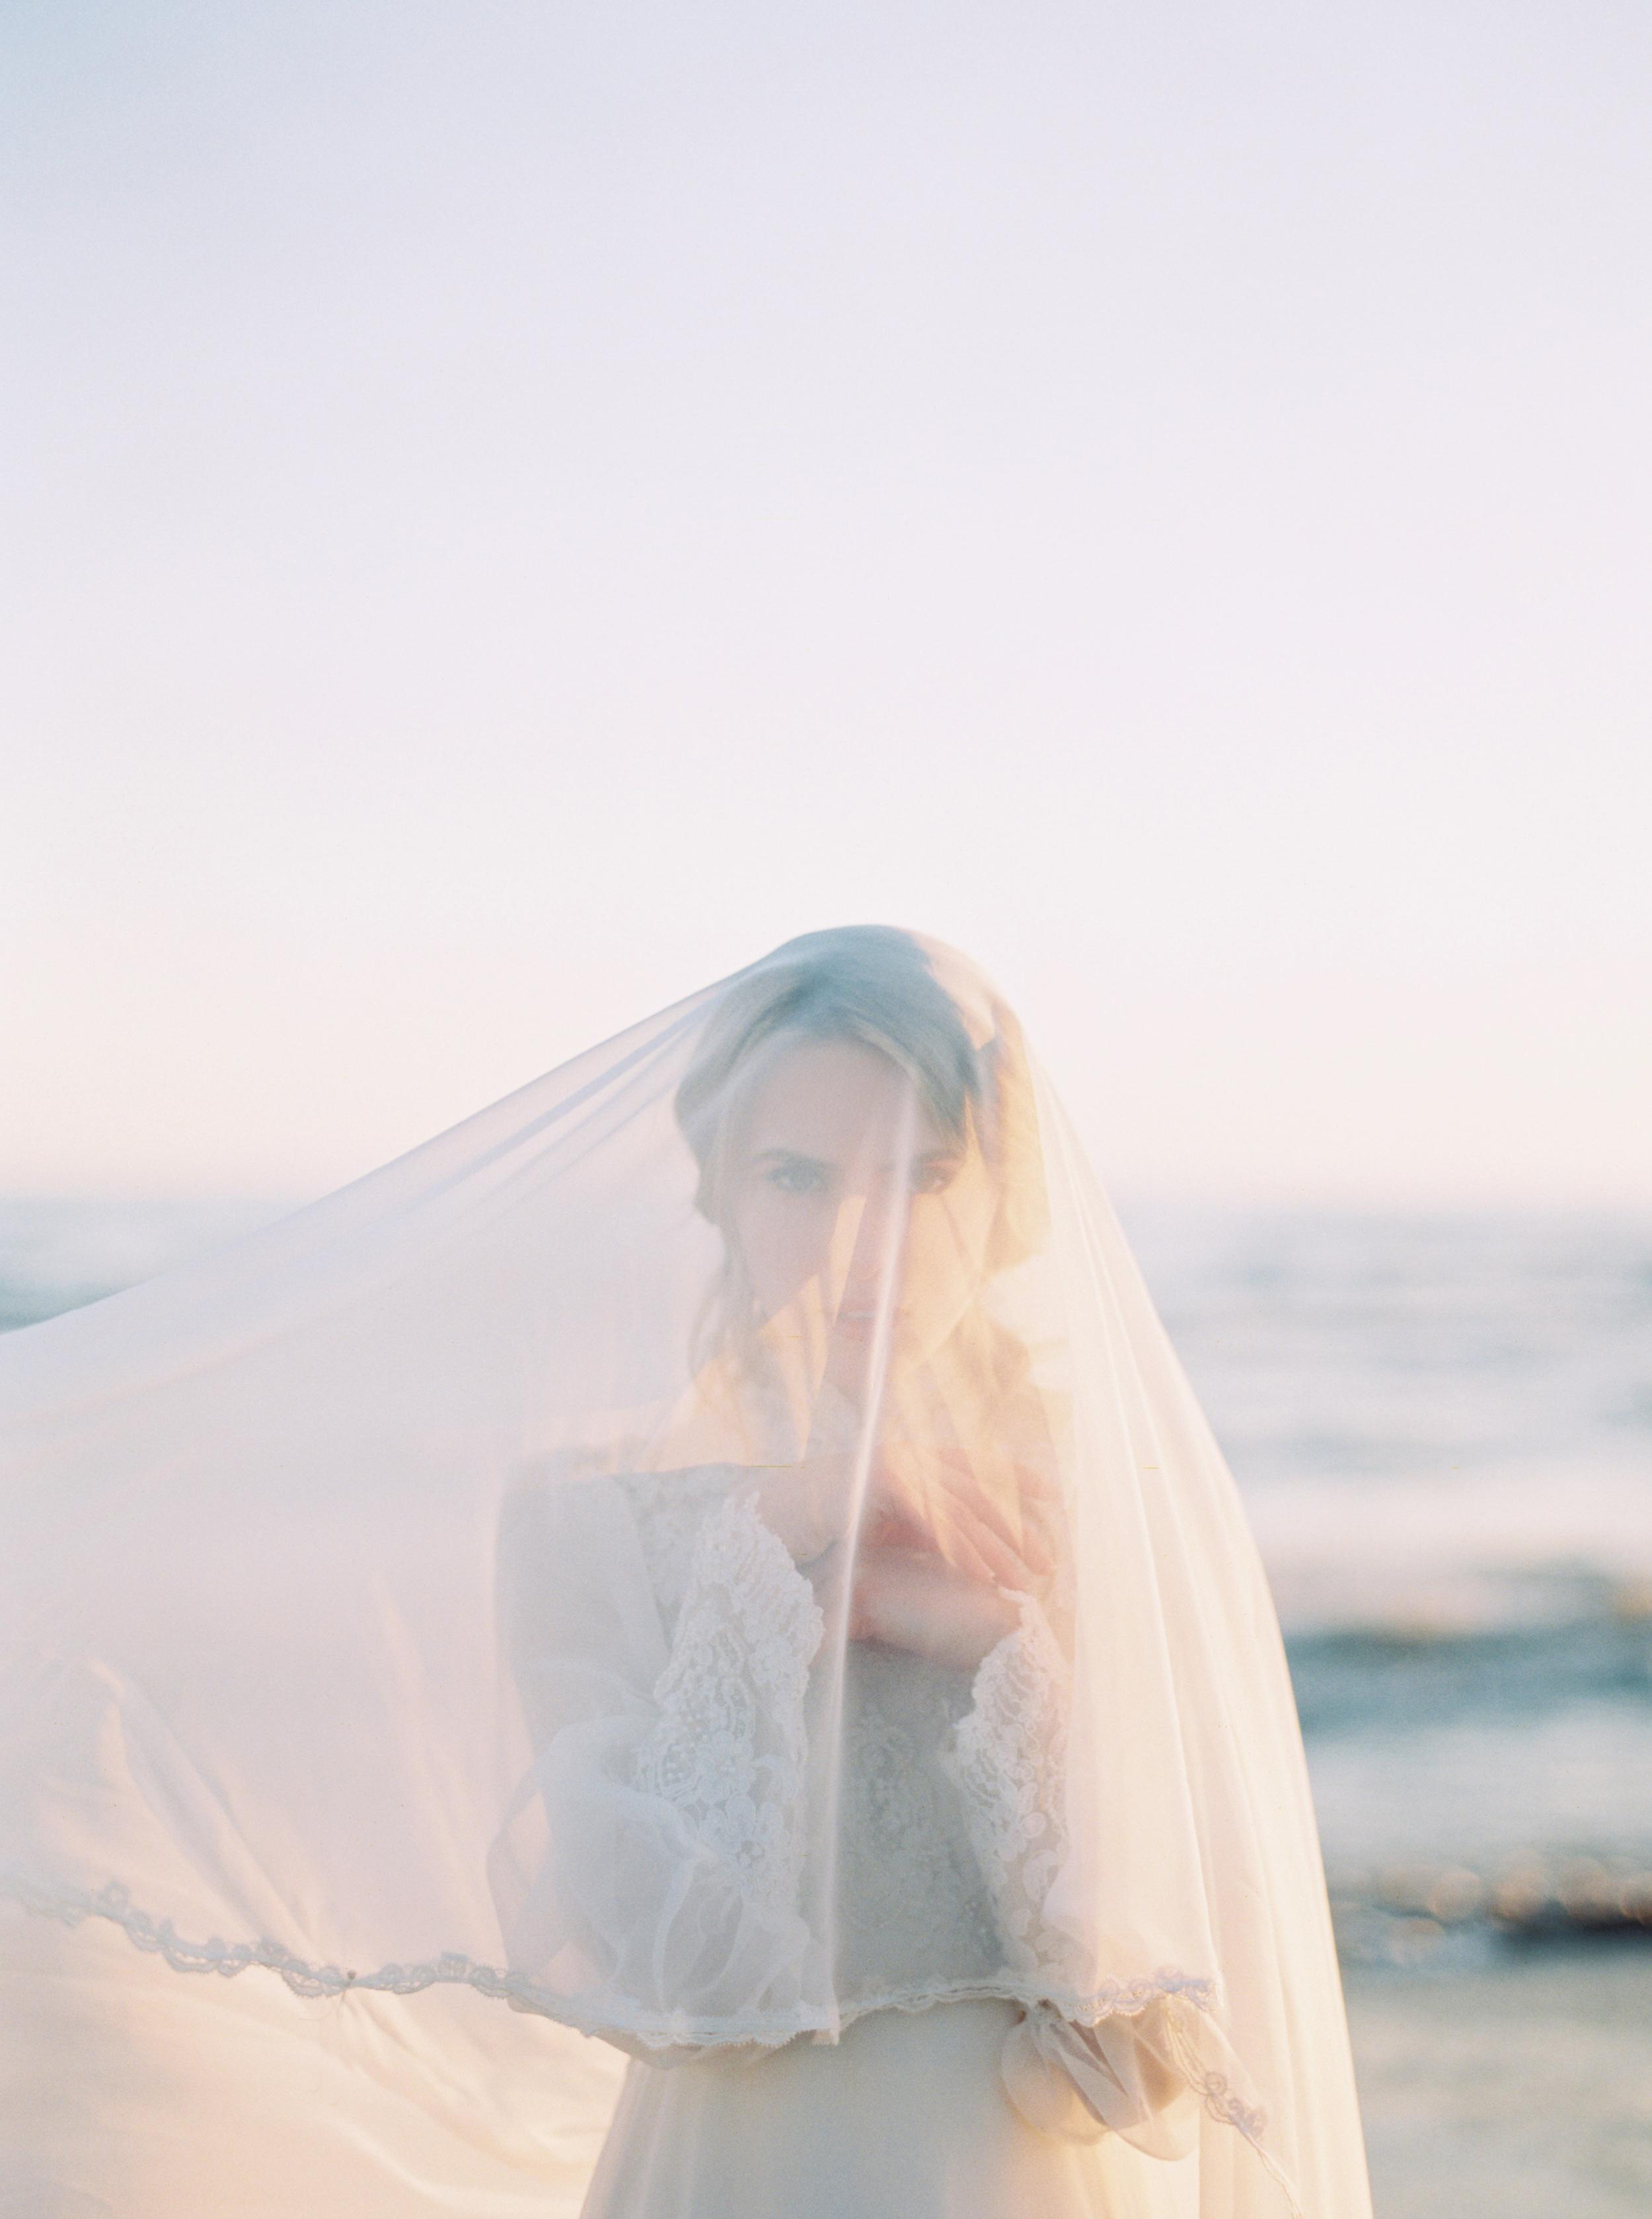 Kyle John l Fine Art Wedding Photography l Chicago, Copenhagen, California, New York, Destination l Blog l Sea and Sand_5